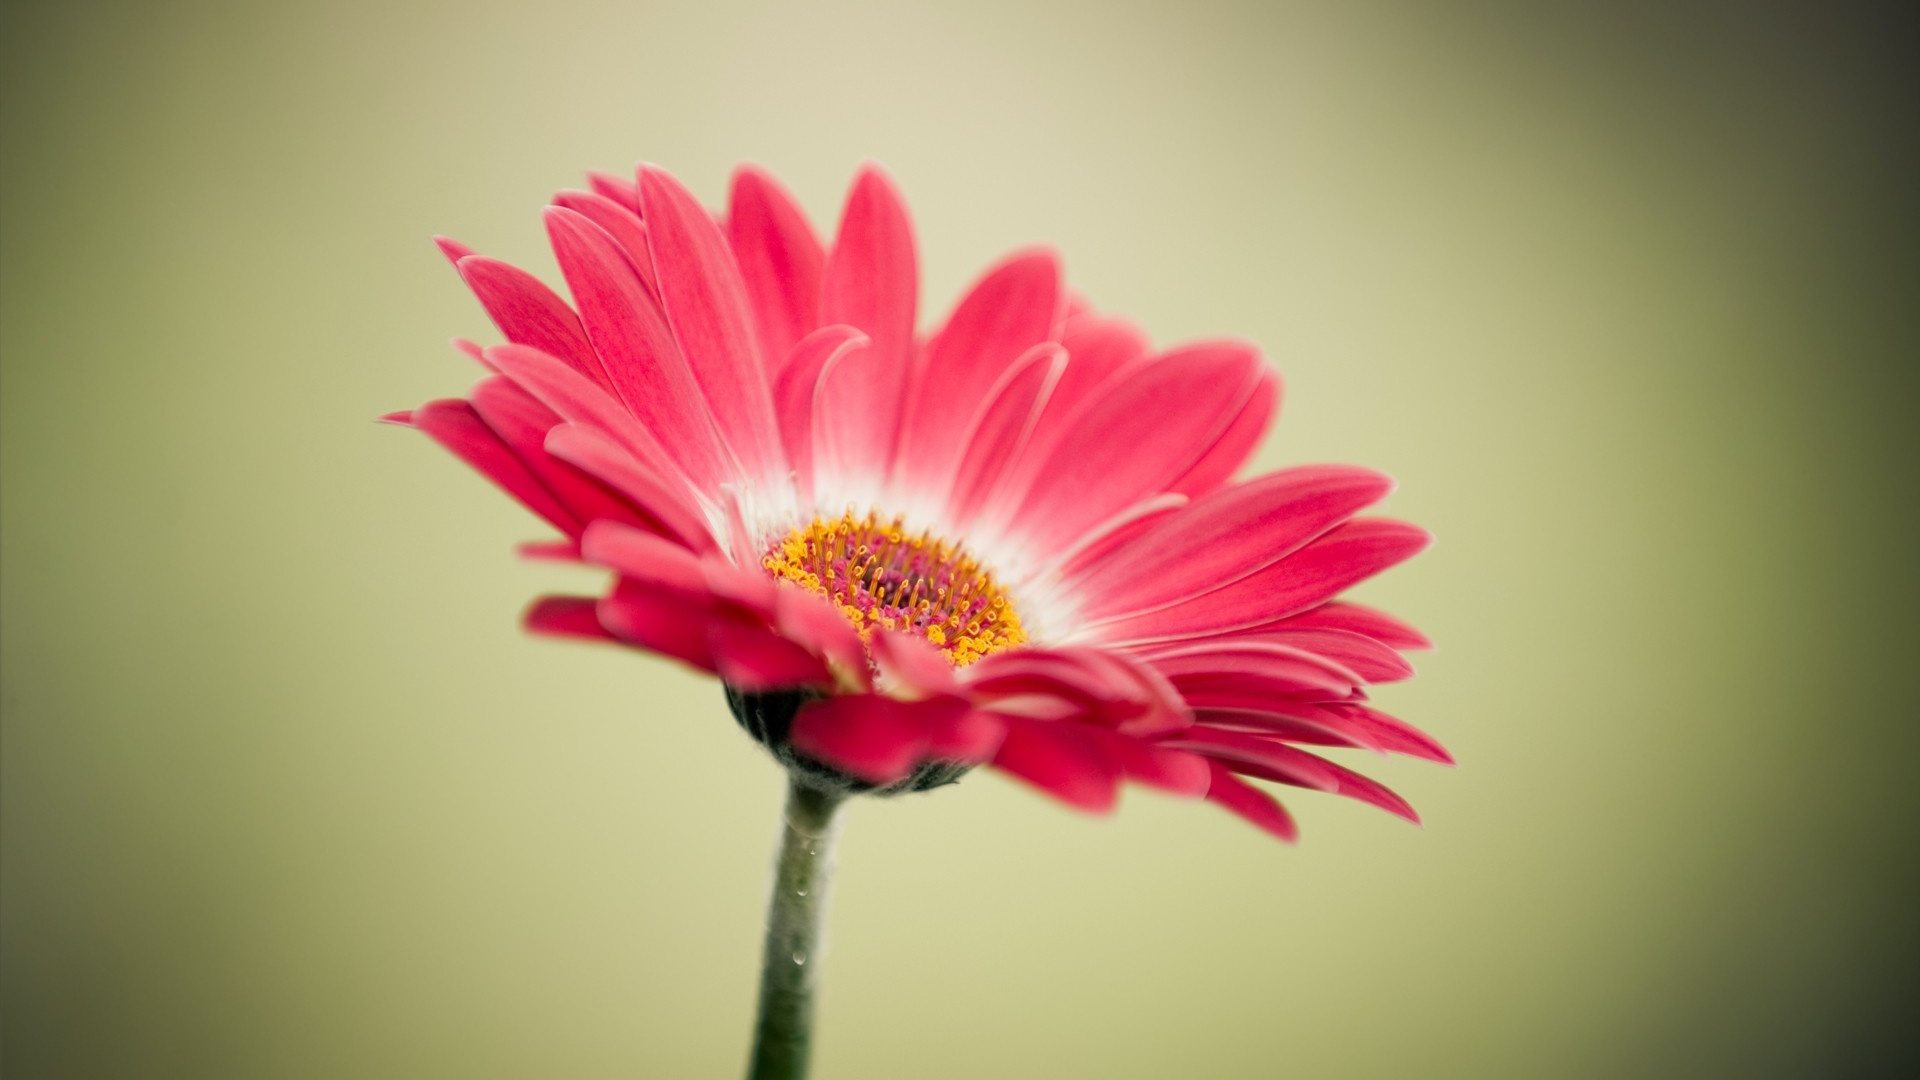 Фото на рабочий стол цветы hd